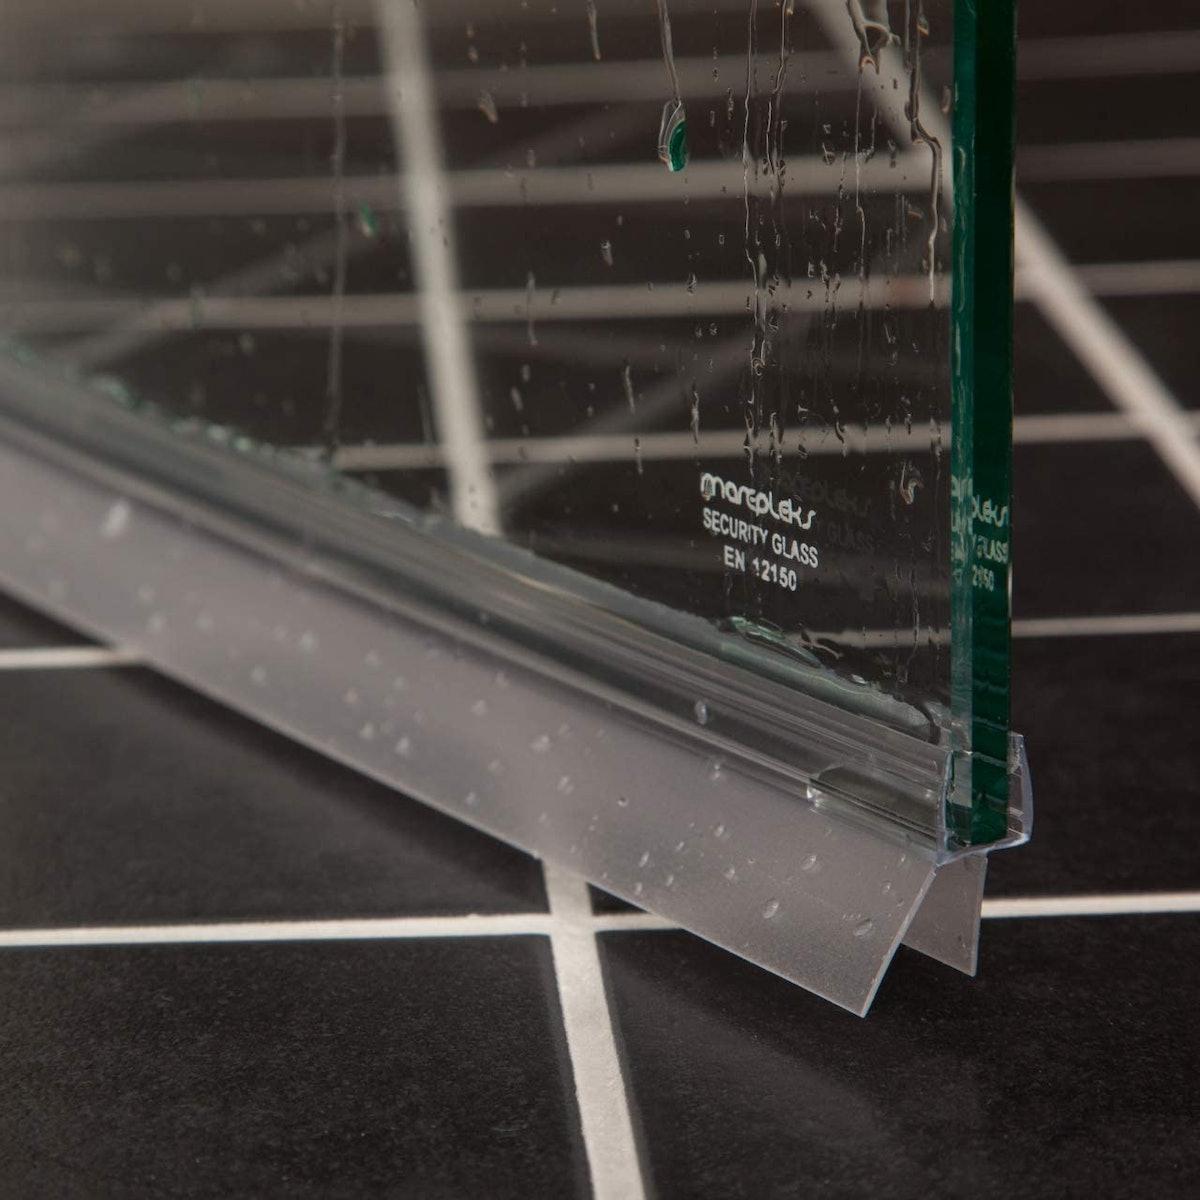 Aulett Home Glass Door Seal Strips (2-Pack)